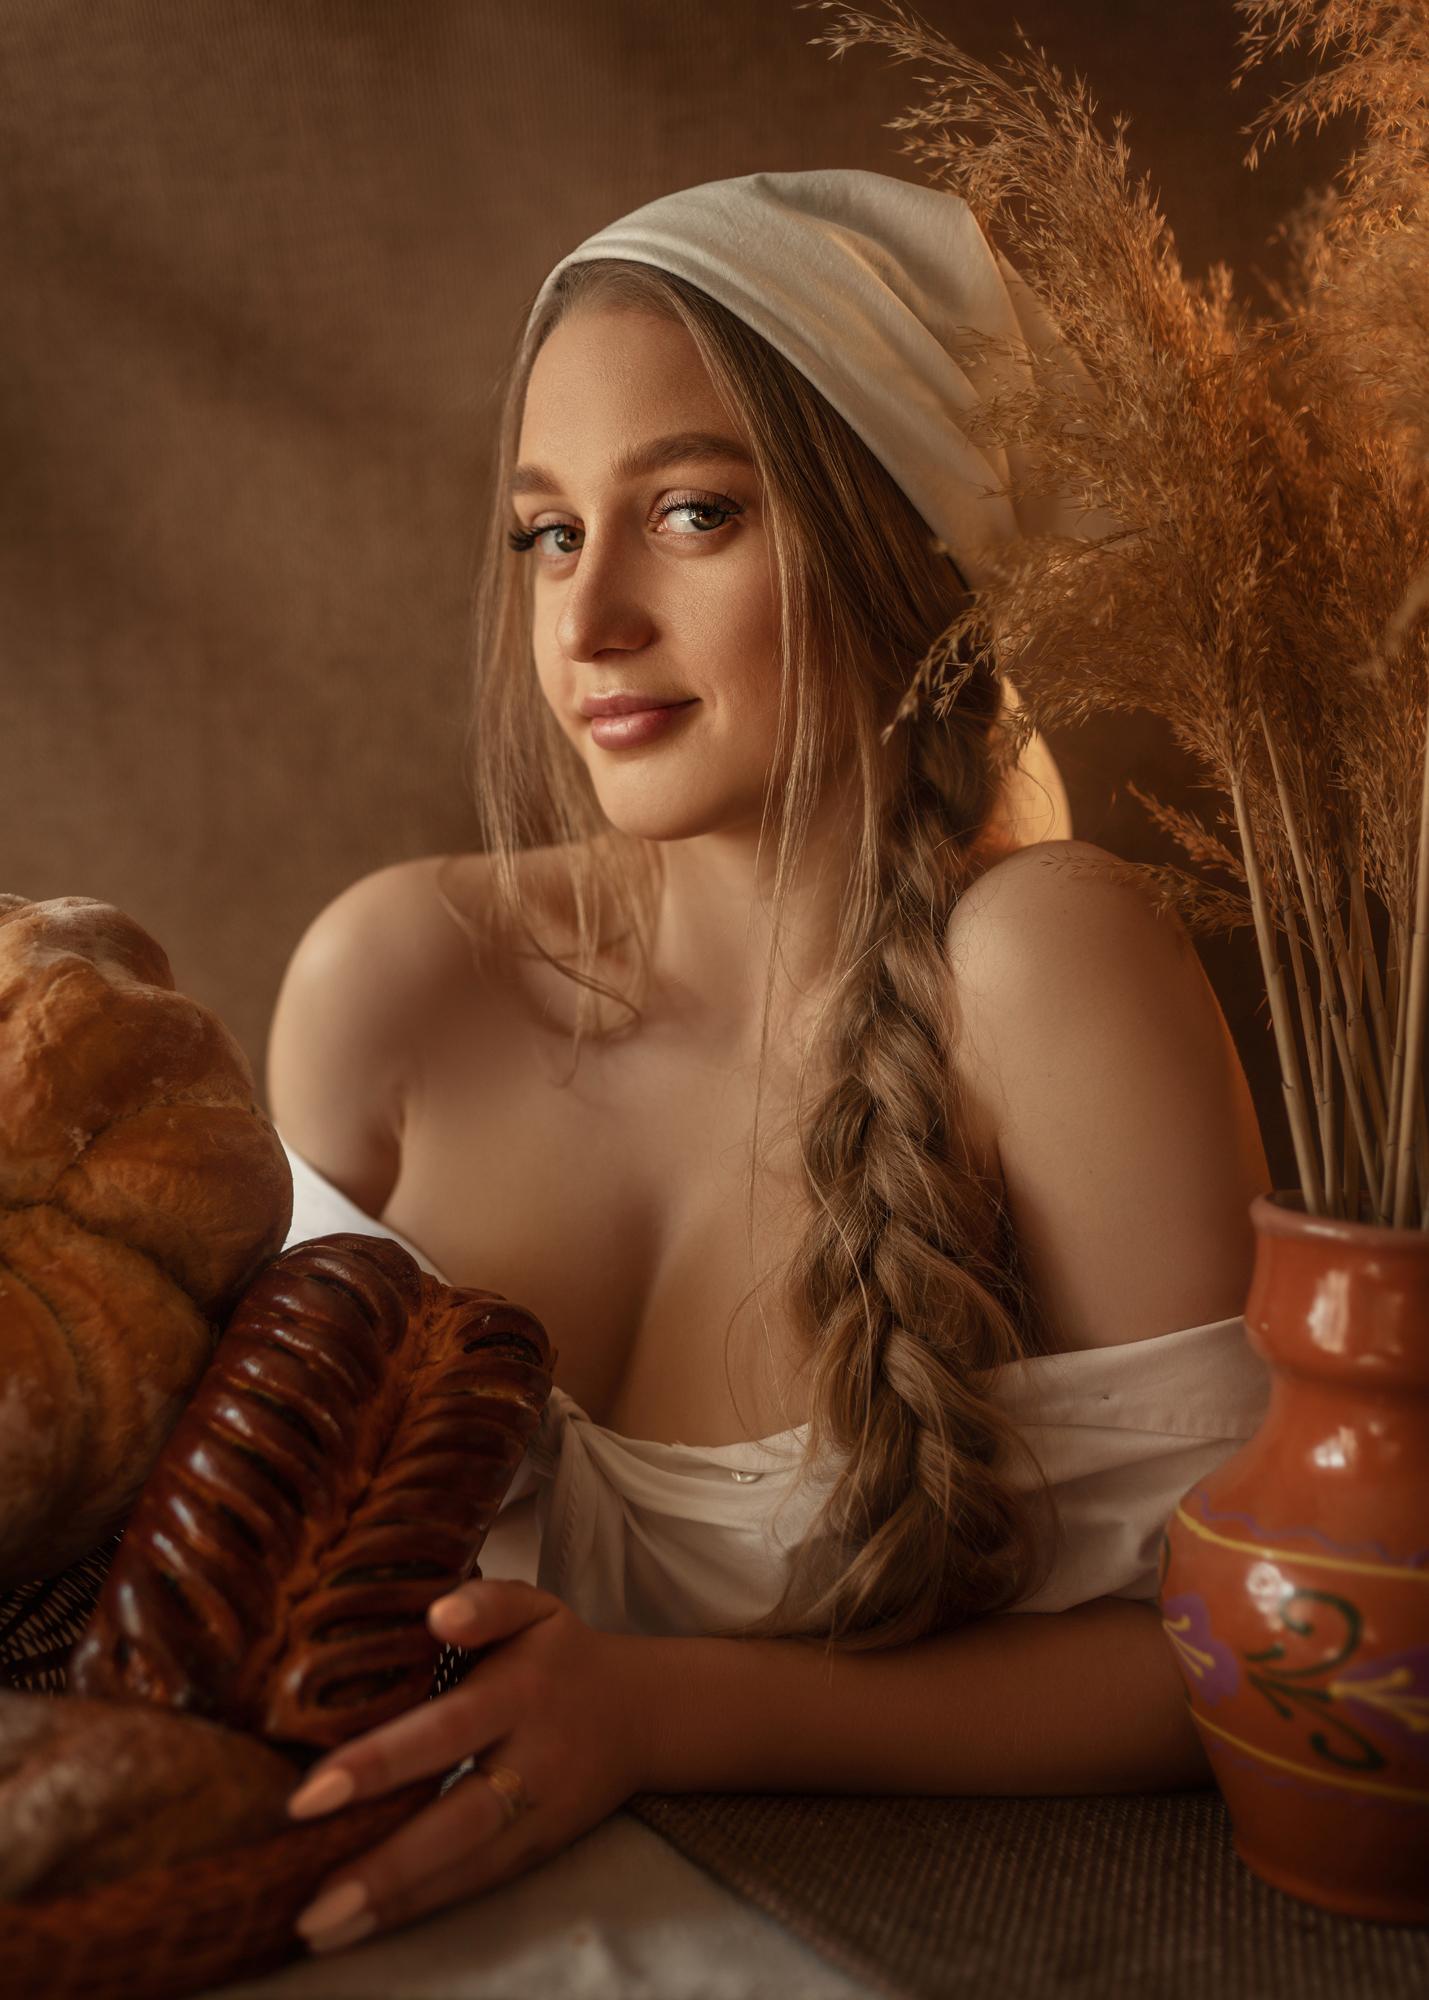 Дарьины булочки / фотограф Николай Кашуба